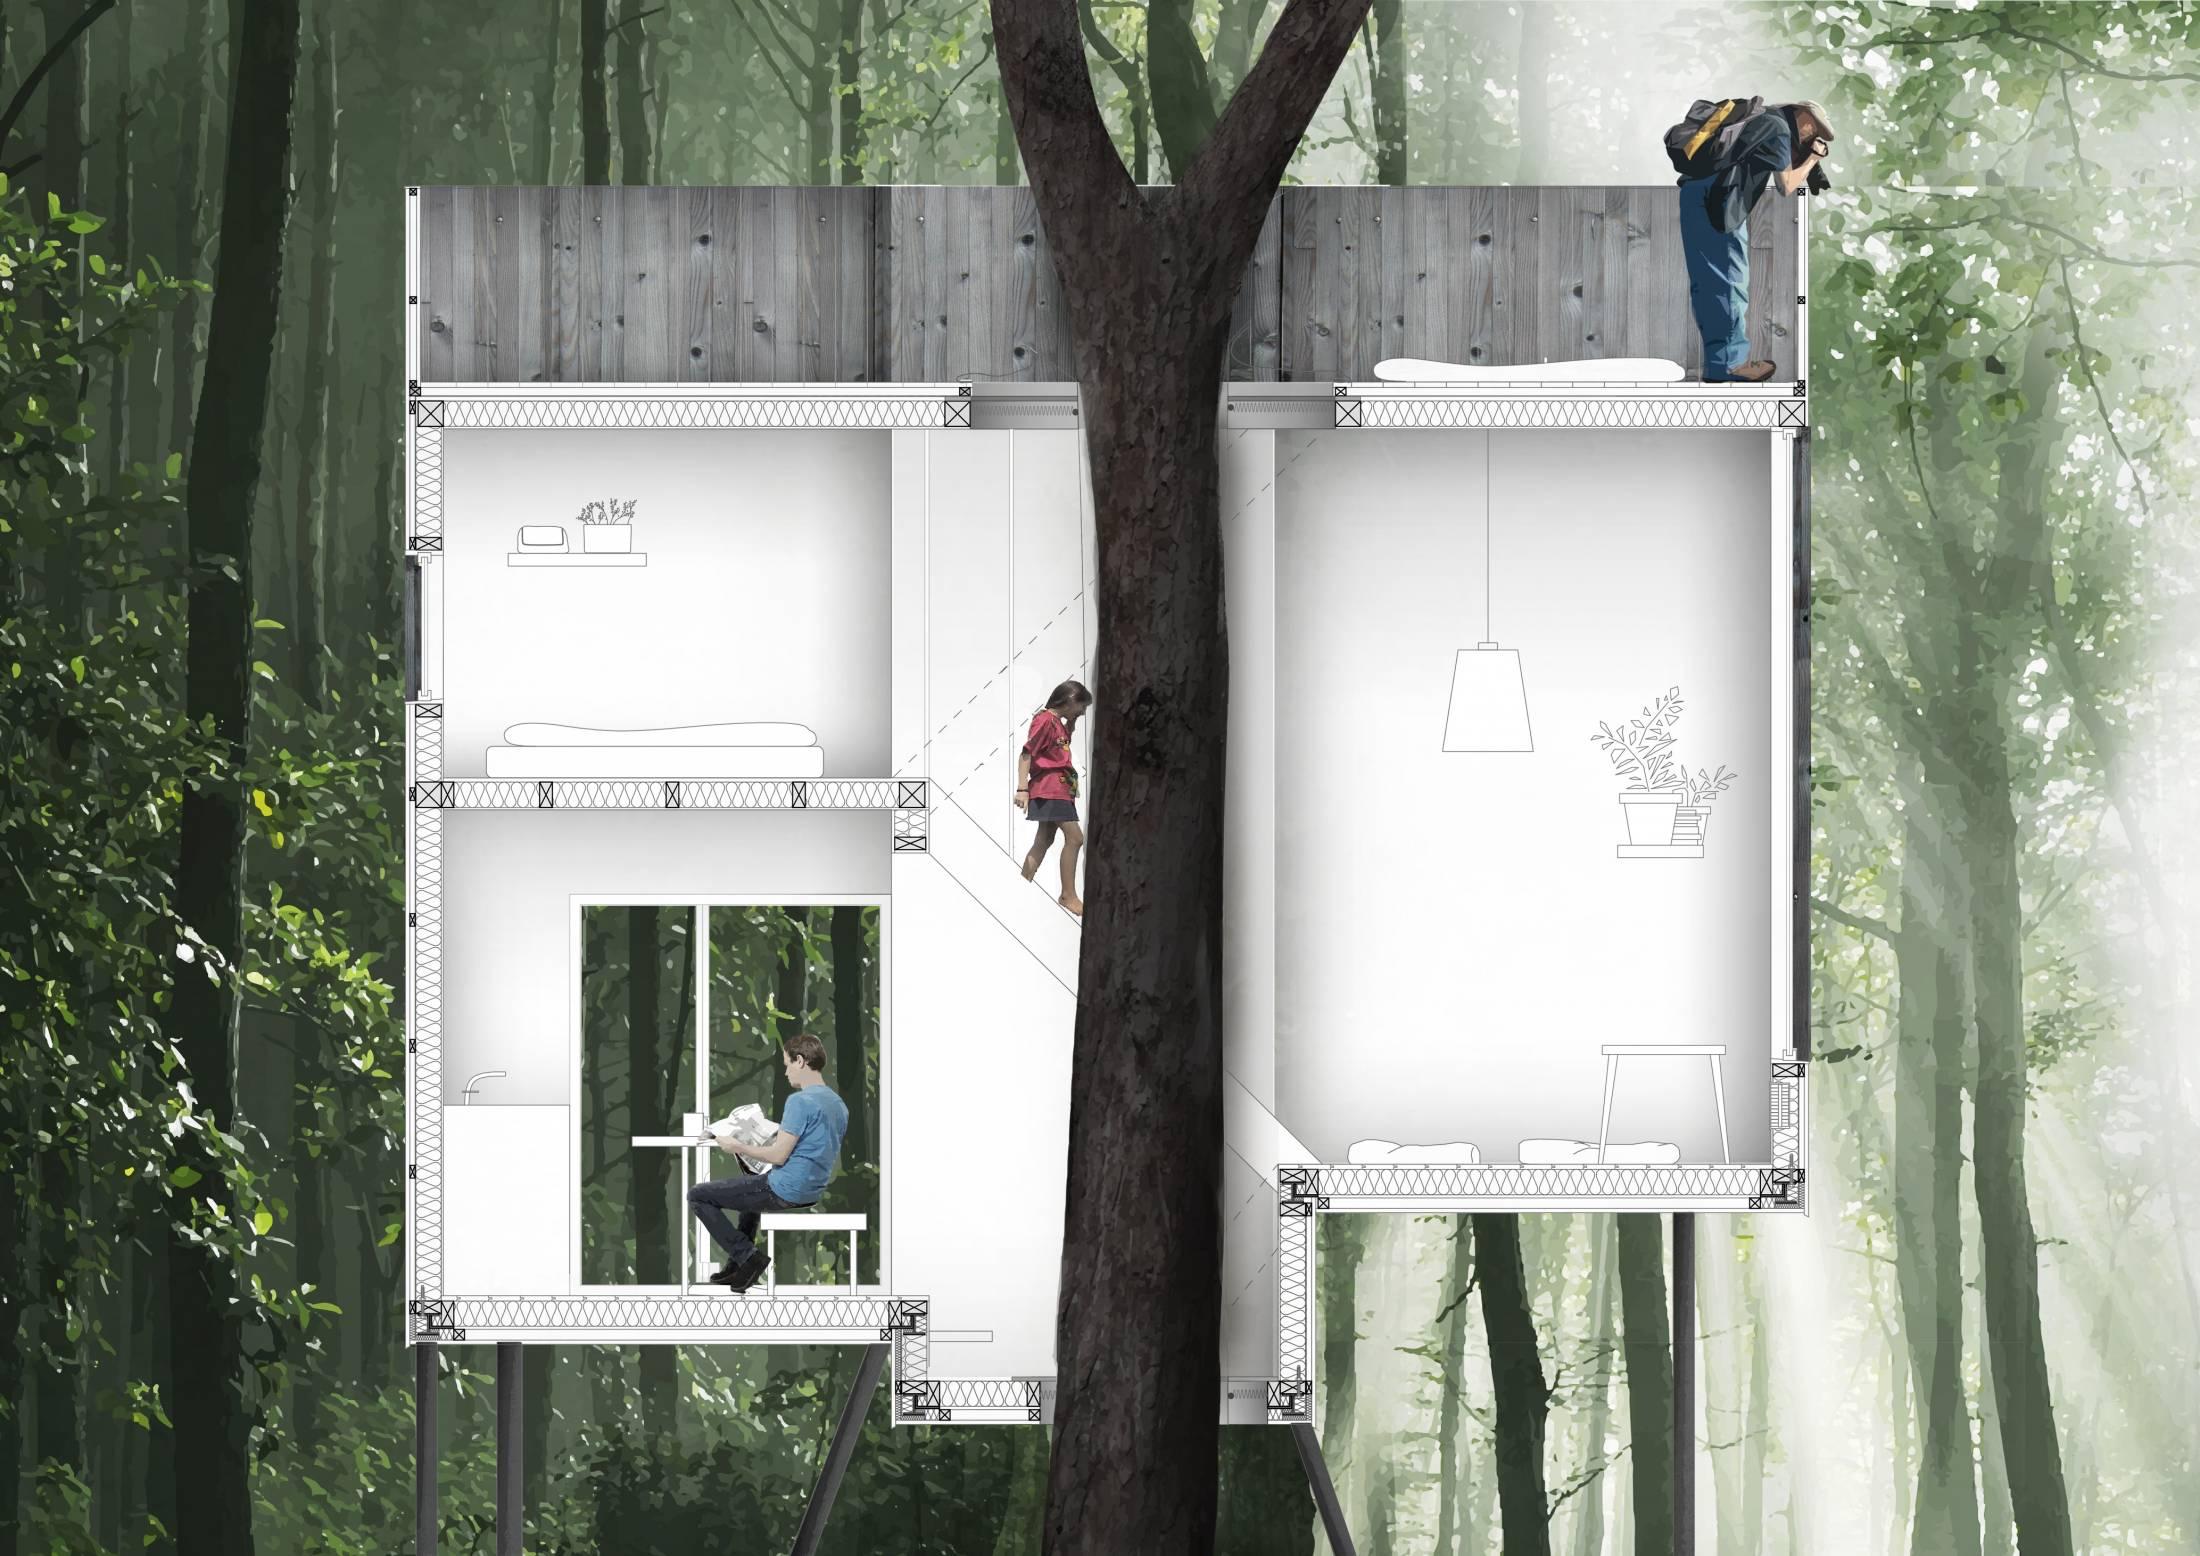 Treetop-Hotel_Denmark_lovtag_Architect-Sigurd-Larsen-axo-forest-House-long-section-1100x778@2x.jpg